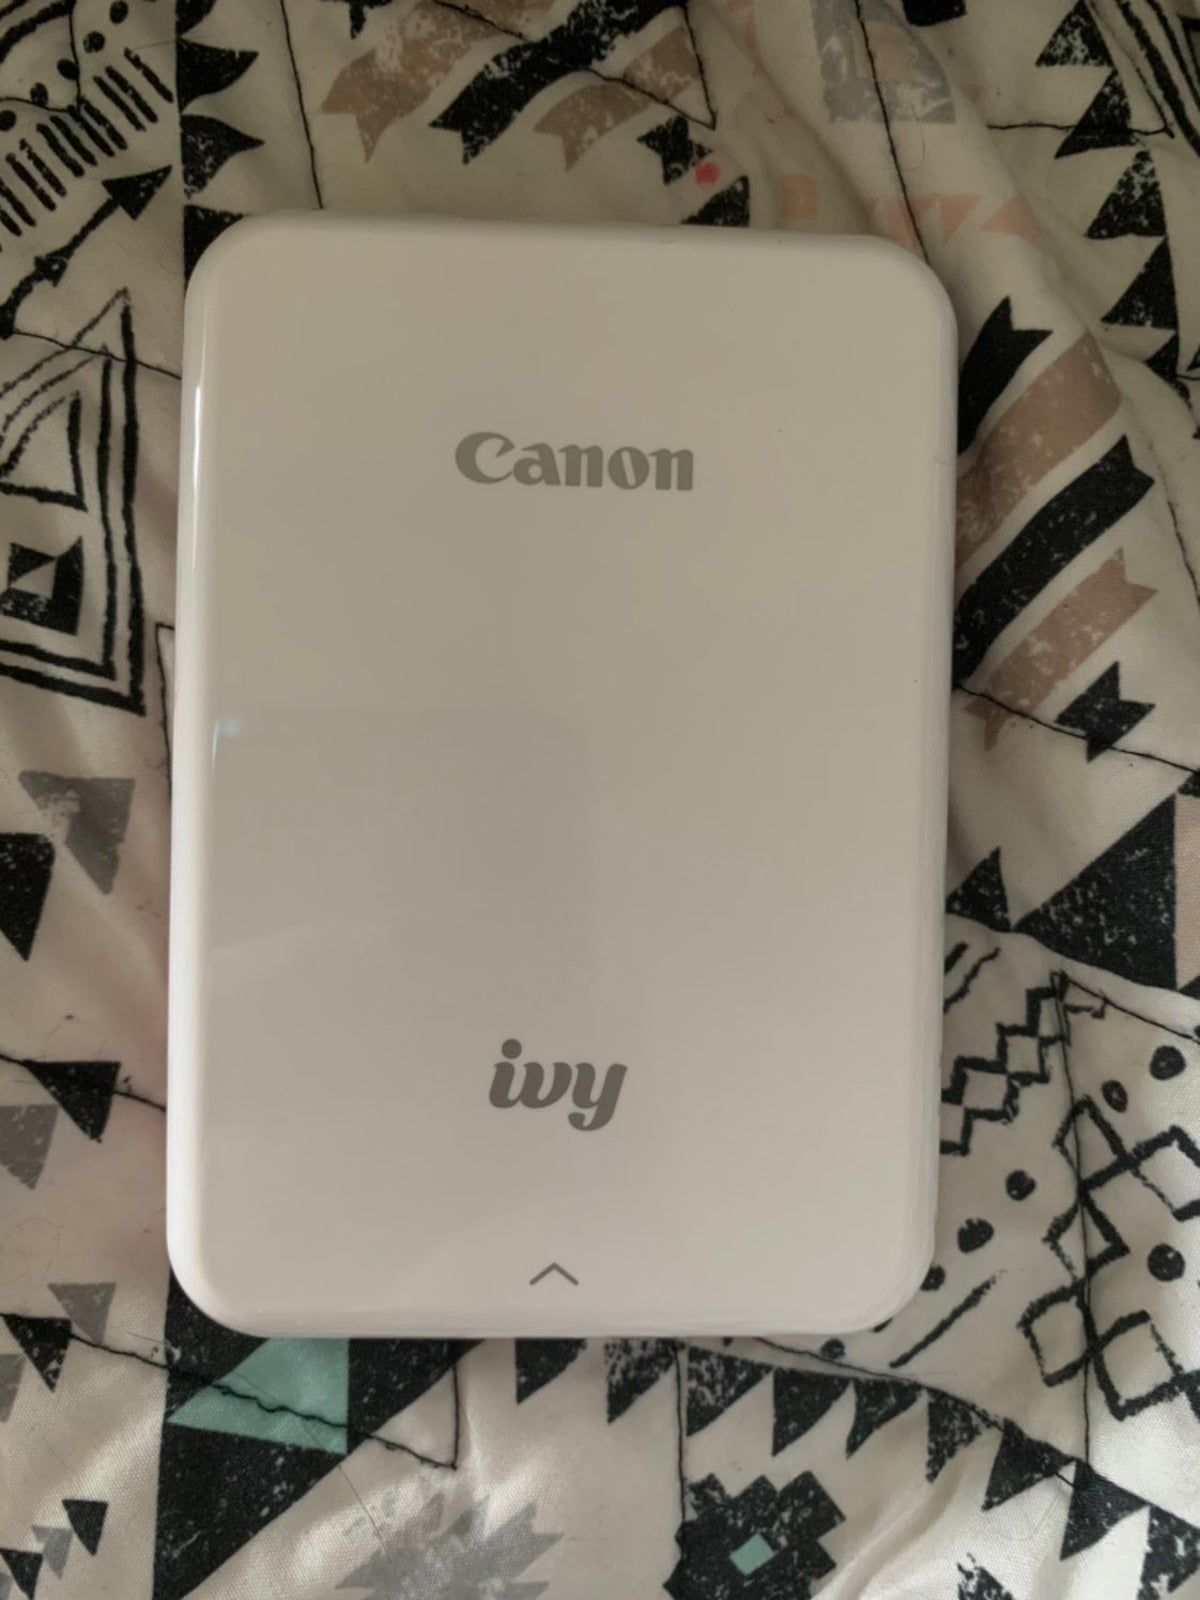 Cannon ivy wireless phone printer ! on Mercari in 2020